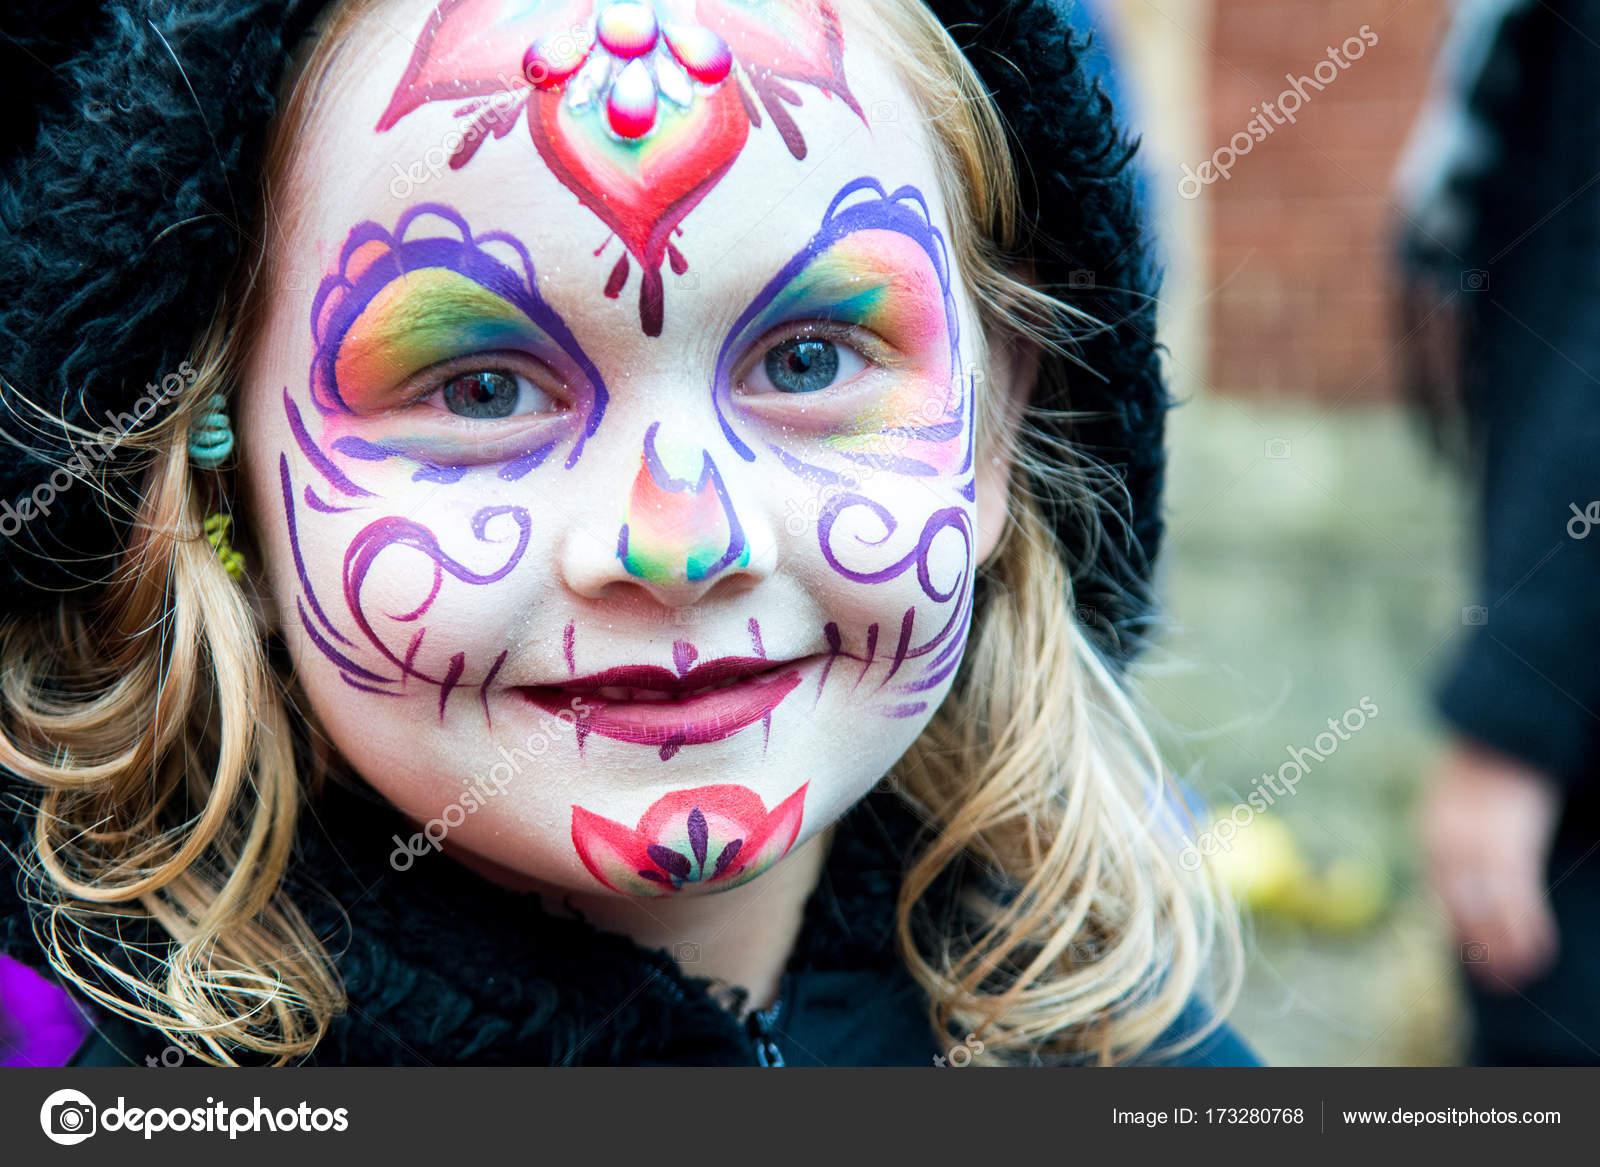 Genç Kız Güzel Ama Korkunç Yüzü Boya Ile Stok Foto Tommoh21